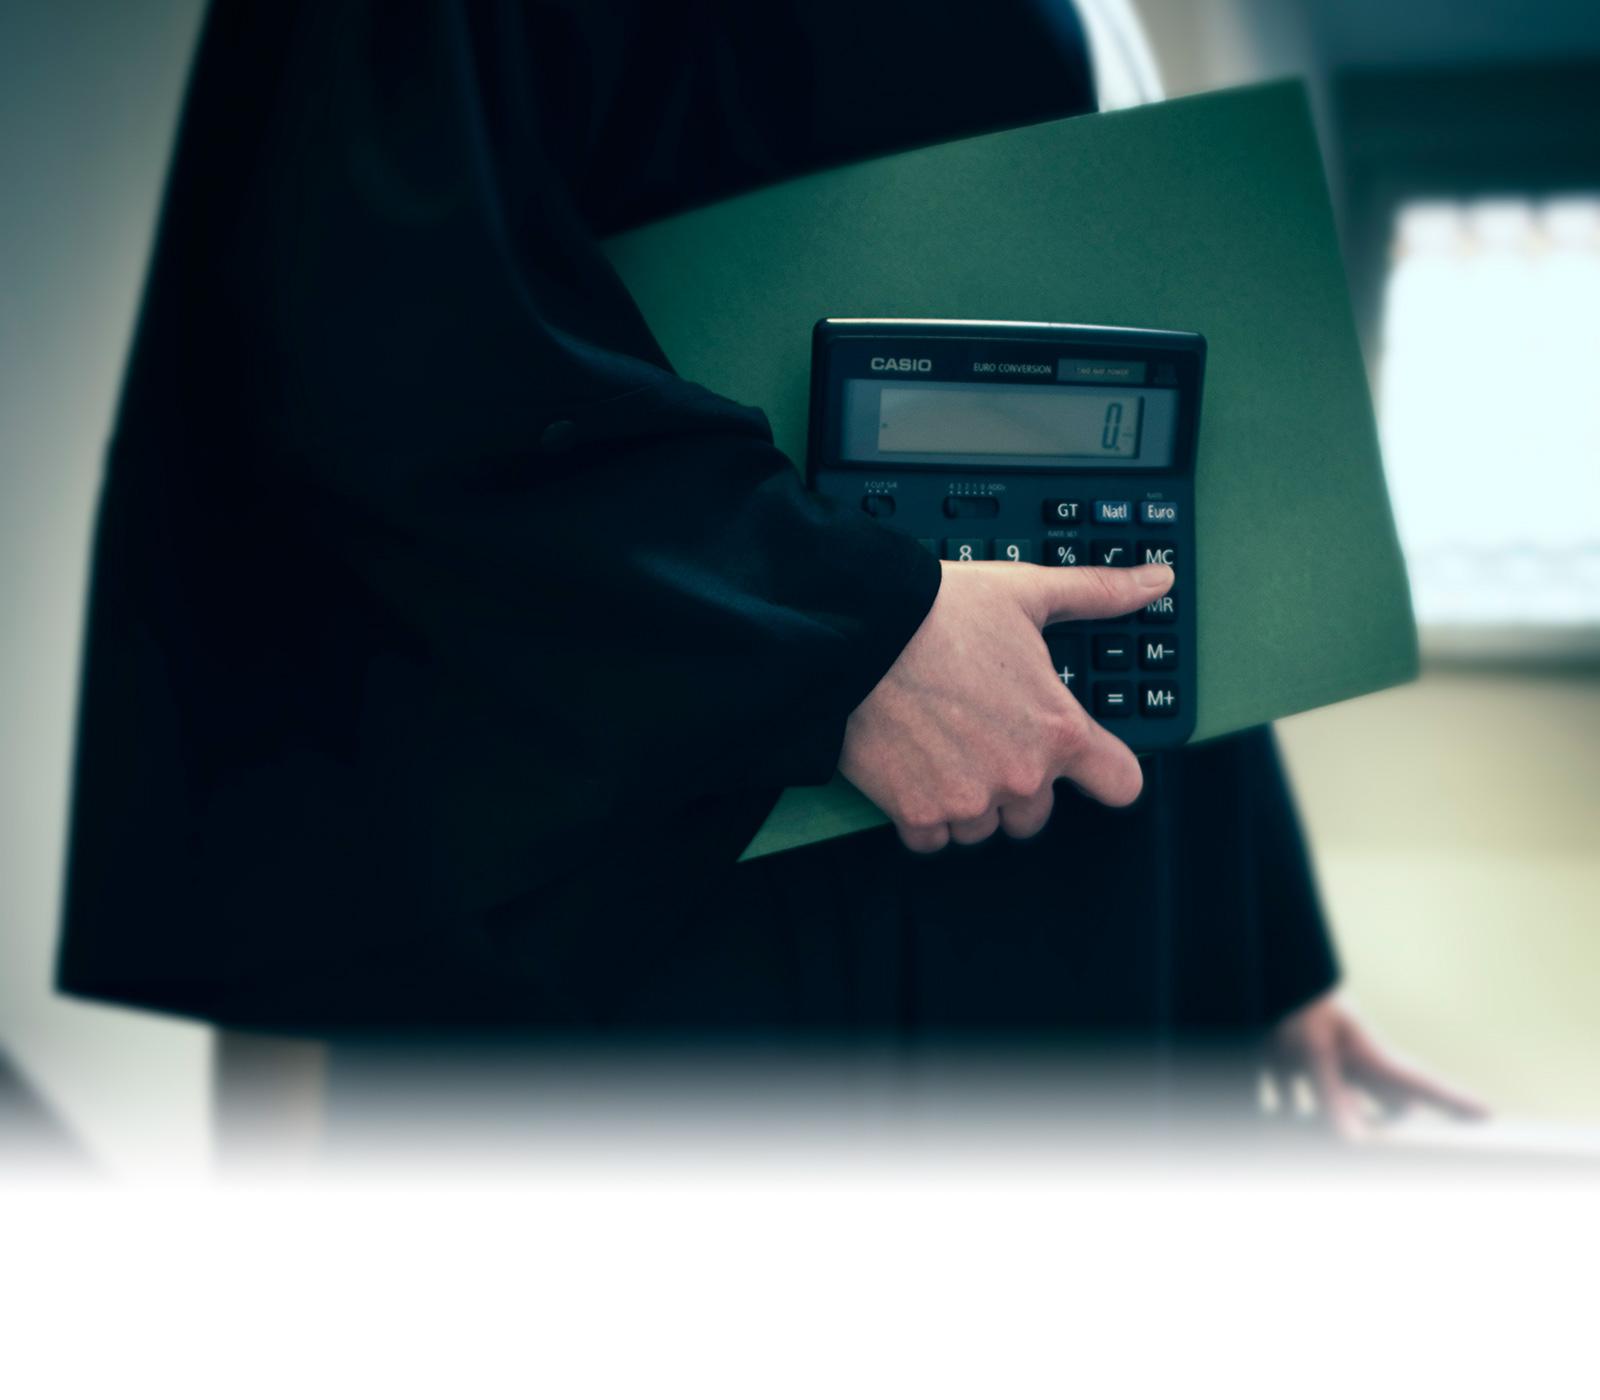 HB advocaten Financieel Economisch Strafrecht